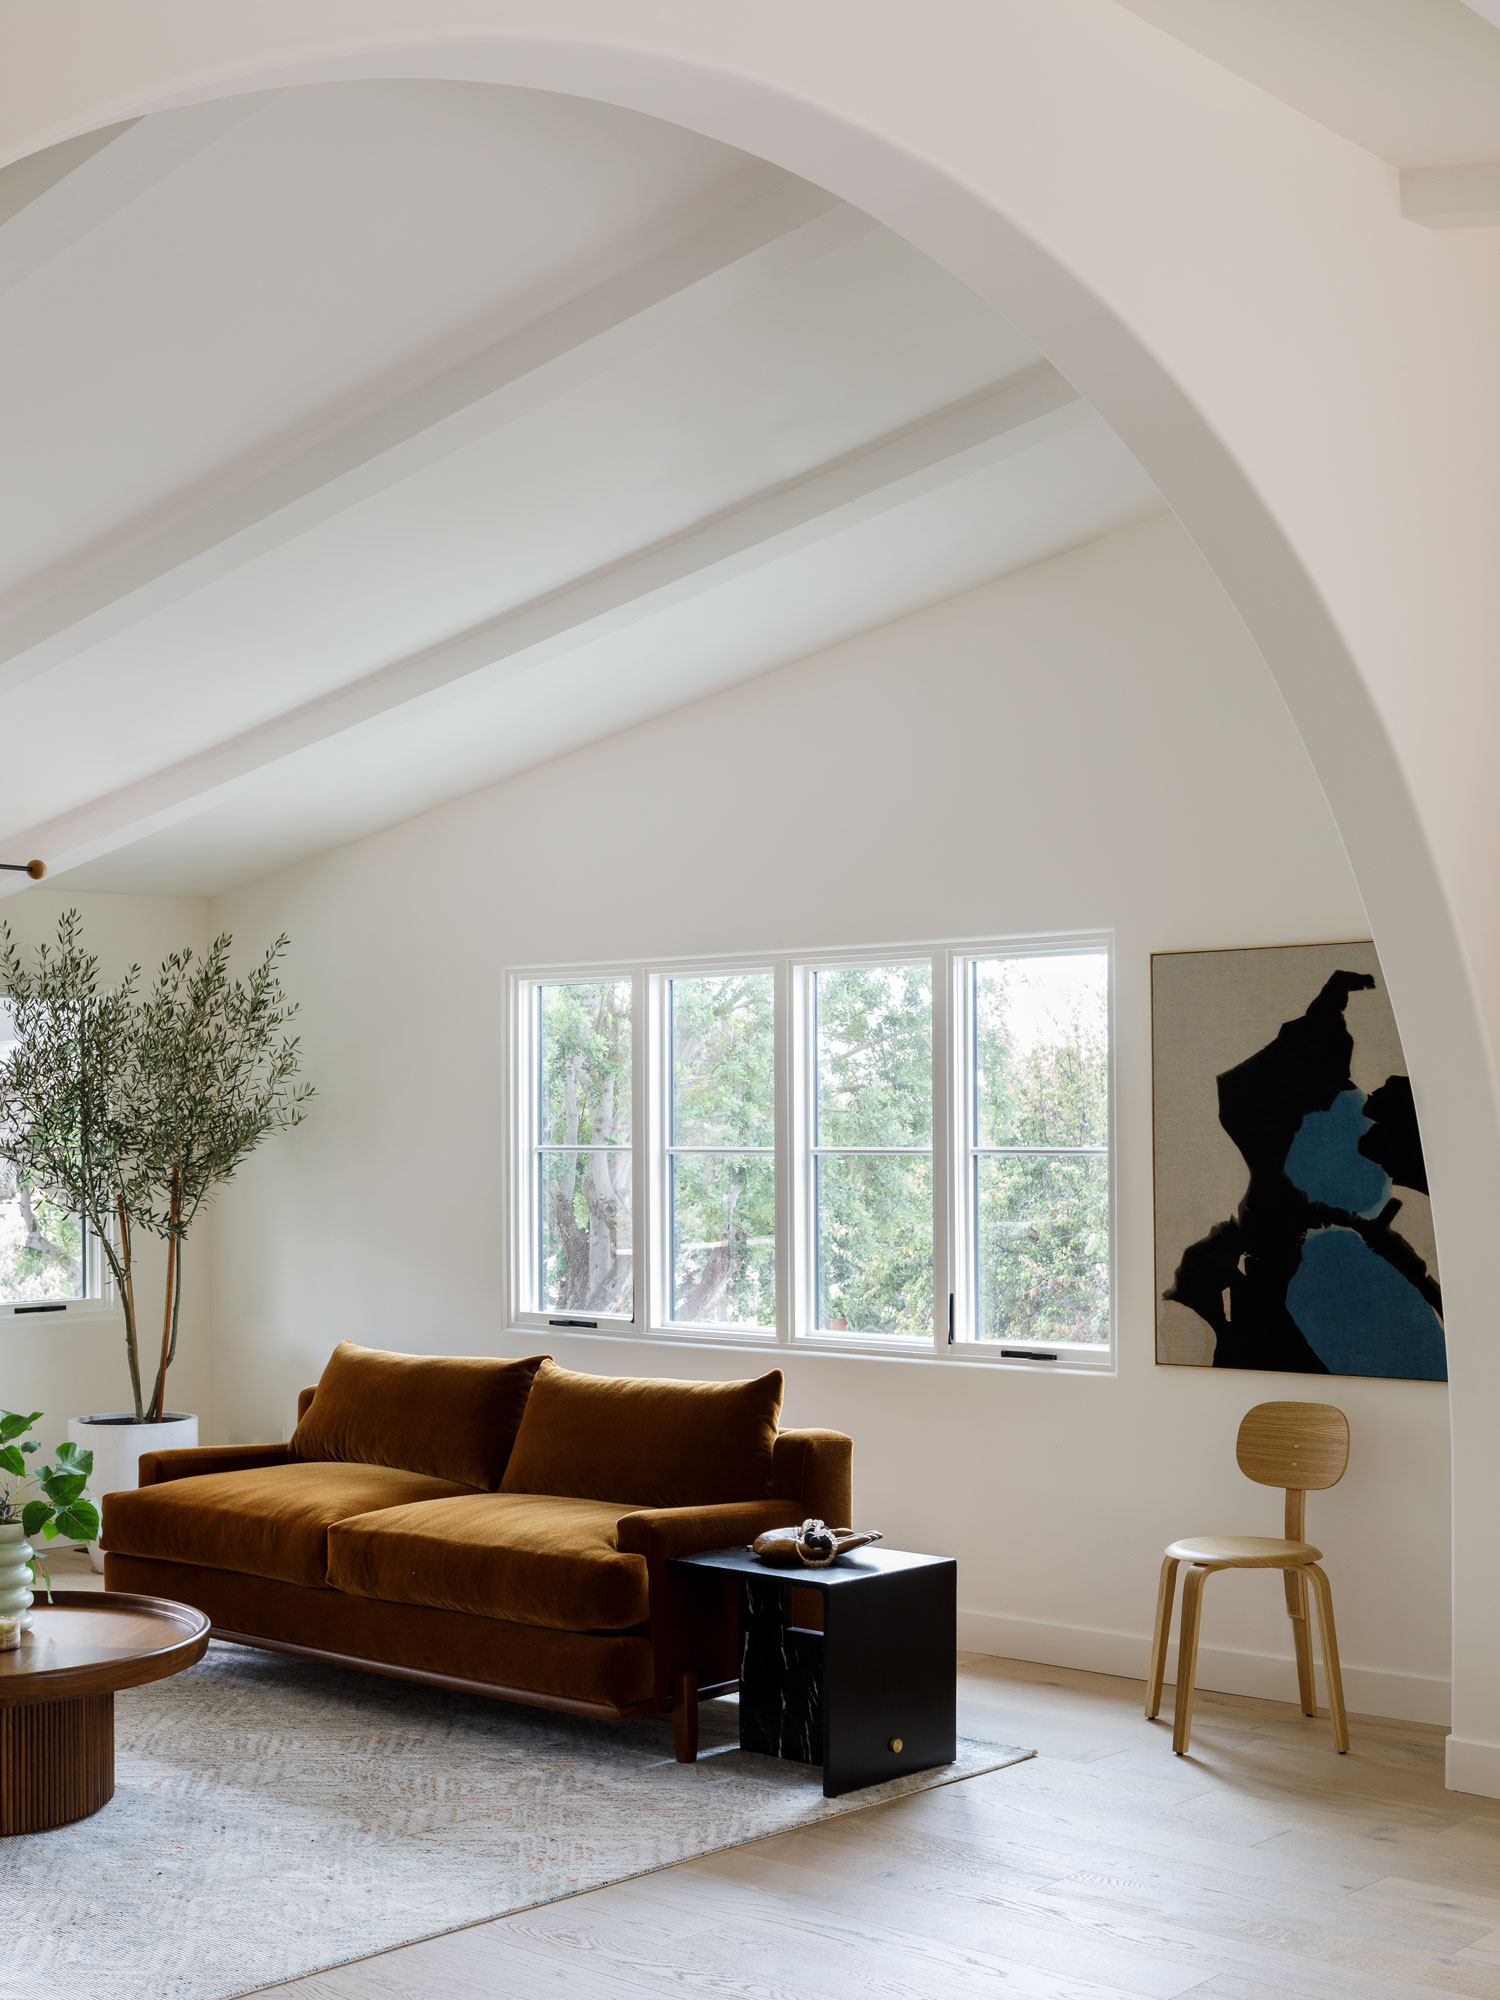 La Fortuna Residence La Home Beatriz Rose Byrdesign Photo Laure Joliet Yellowtrace 02